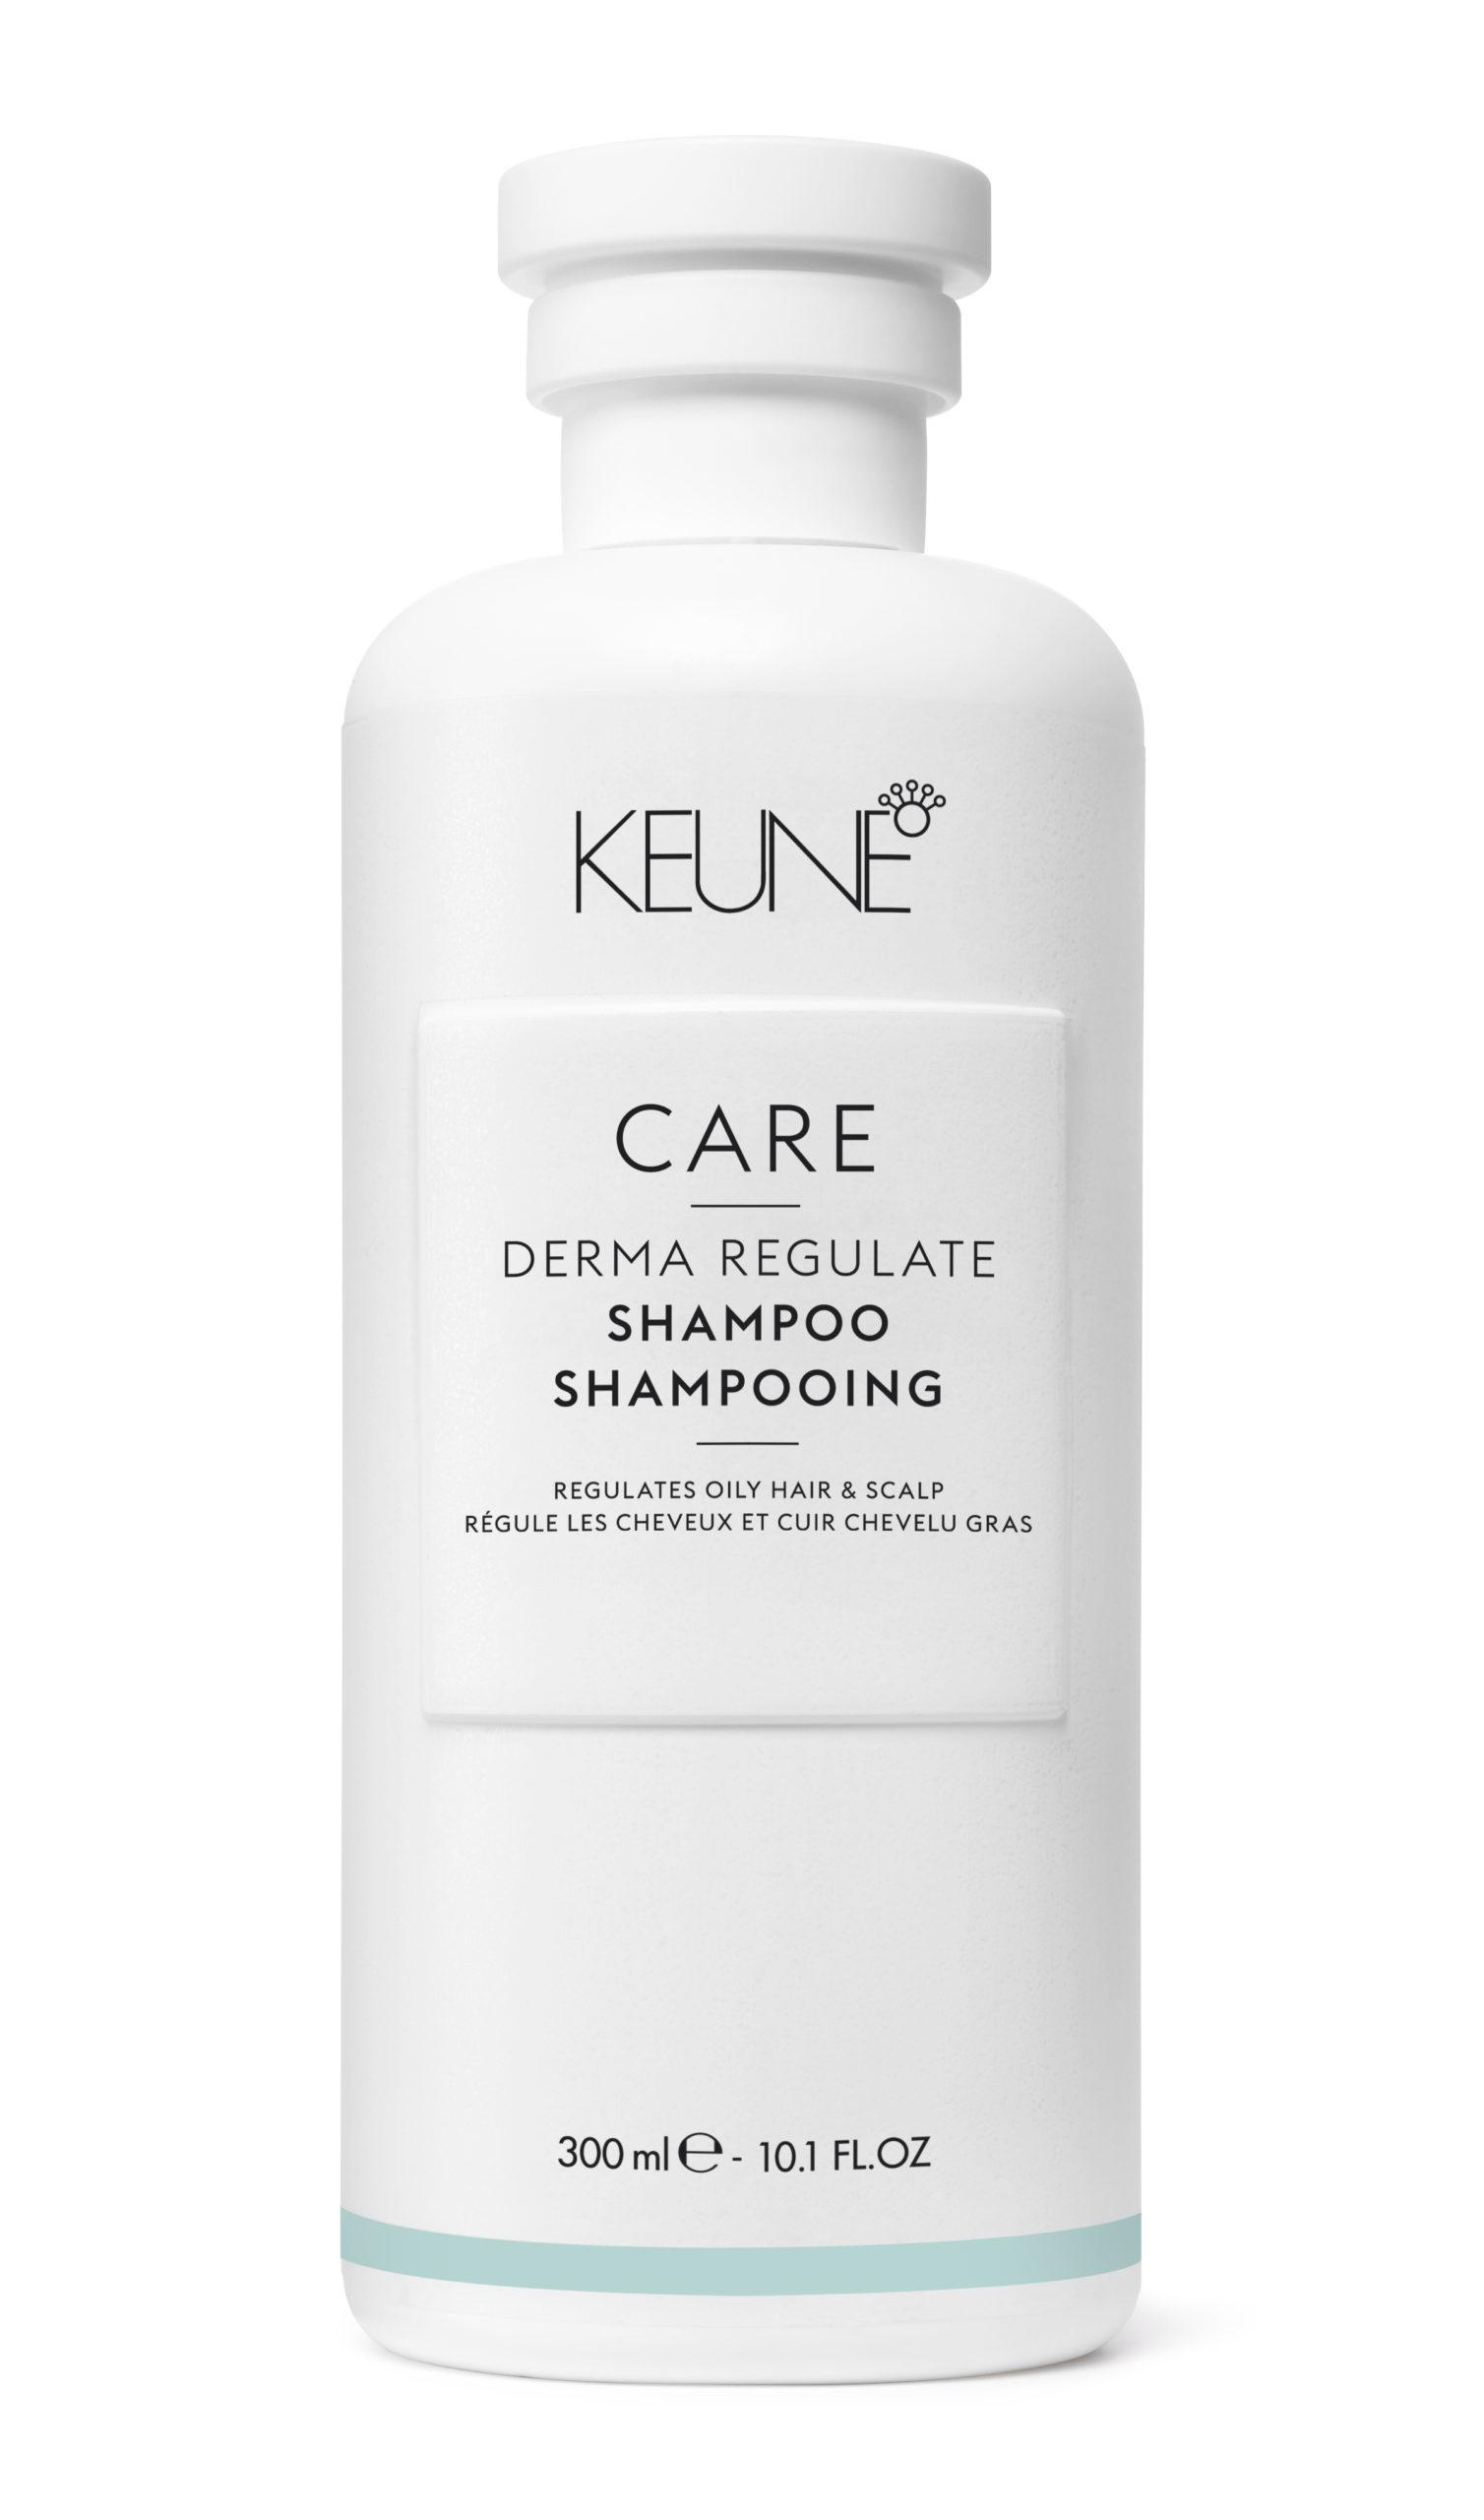 Care-Derma-Regulate-Shampoo-300ml-highres